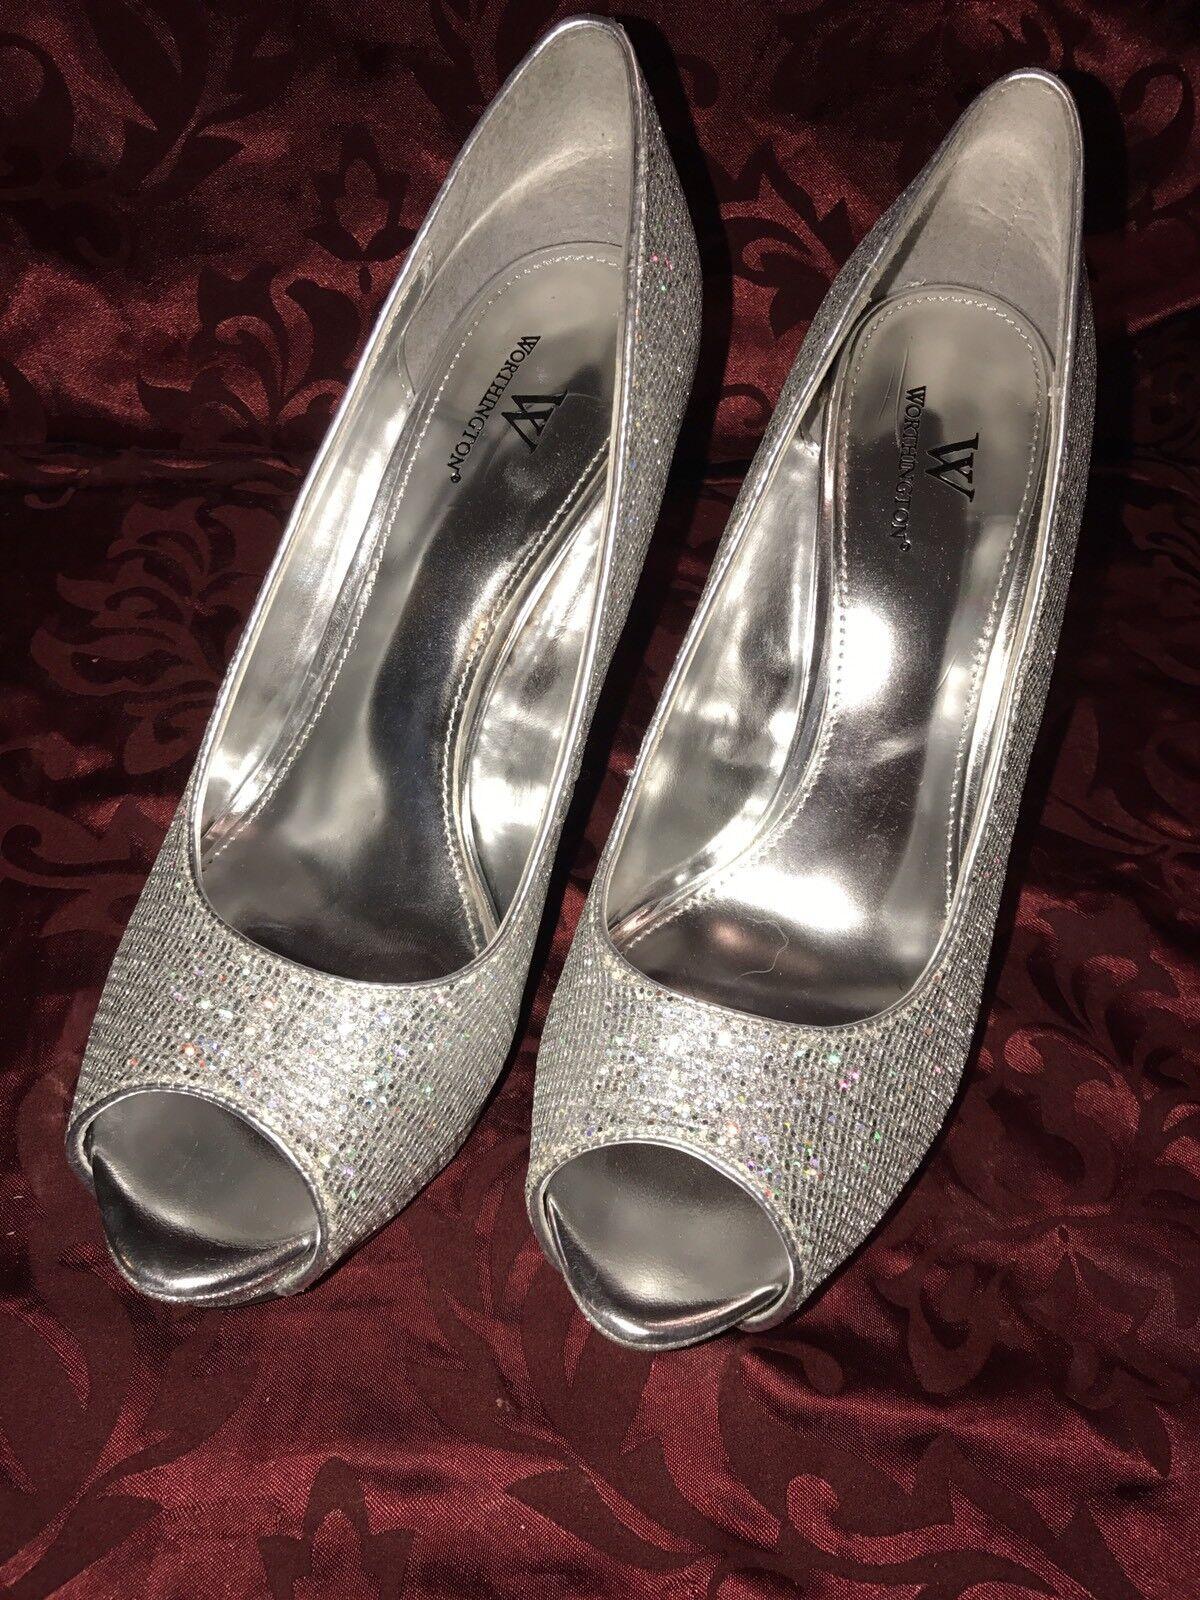 -Sharp-Worthington Silver M Stiletto Pump 8 1/2 M Silver Glitter High Heel Open Toe 6e615d